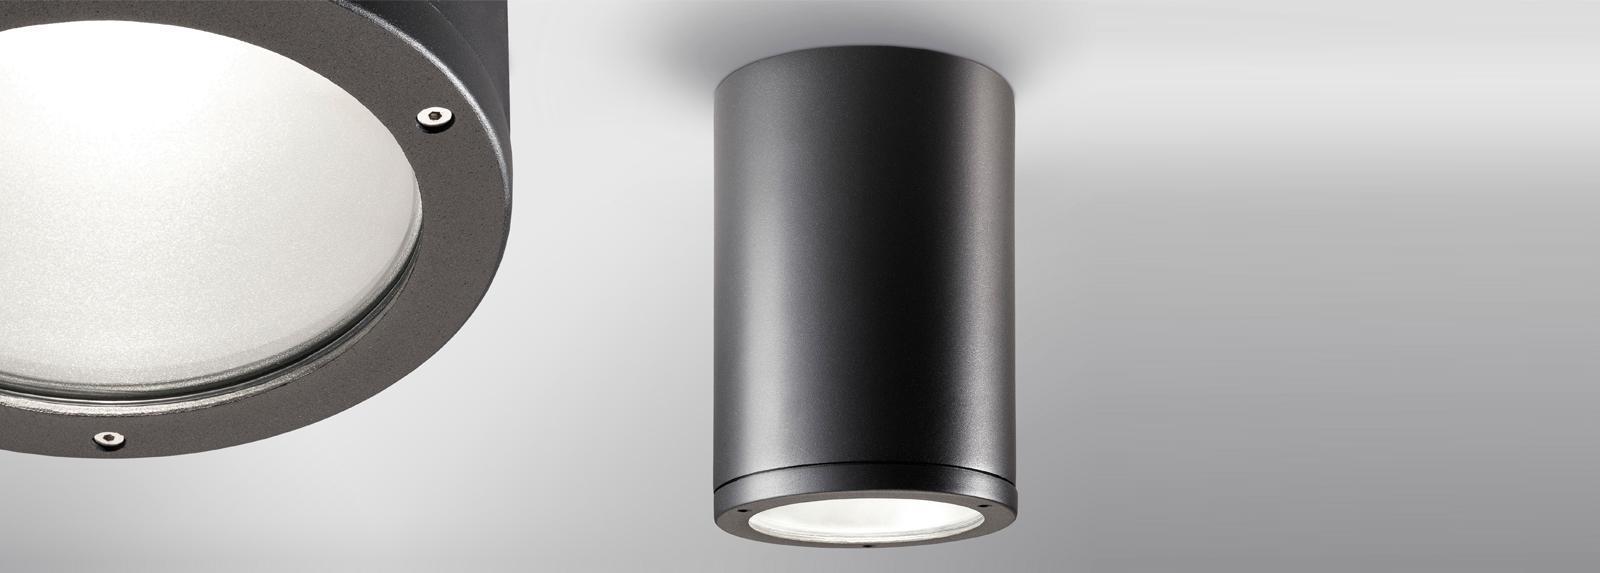 Inspiration about Rovasi. Lighting Fixtures Manufacturer. Complete Range Of Regarding Outdoor Ceiling Downlights (#9 of 15)